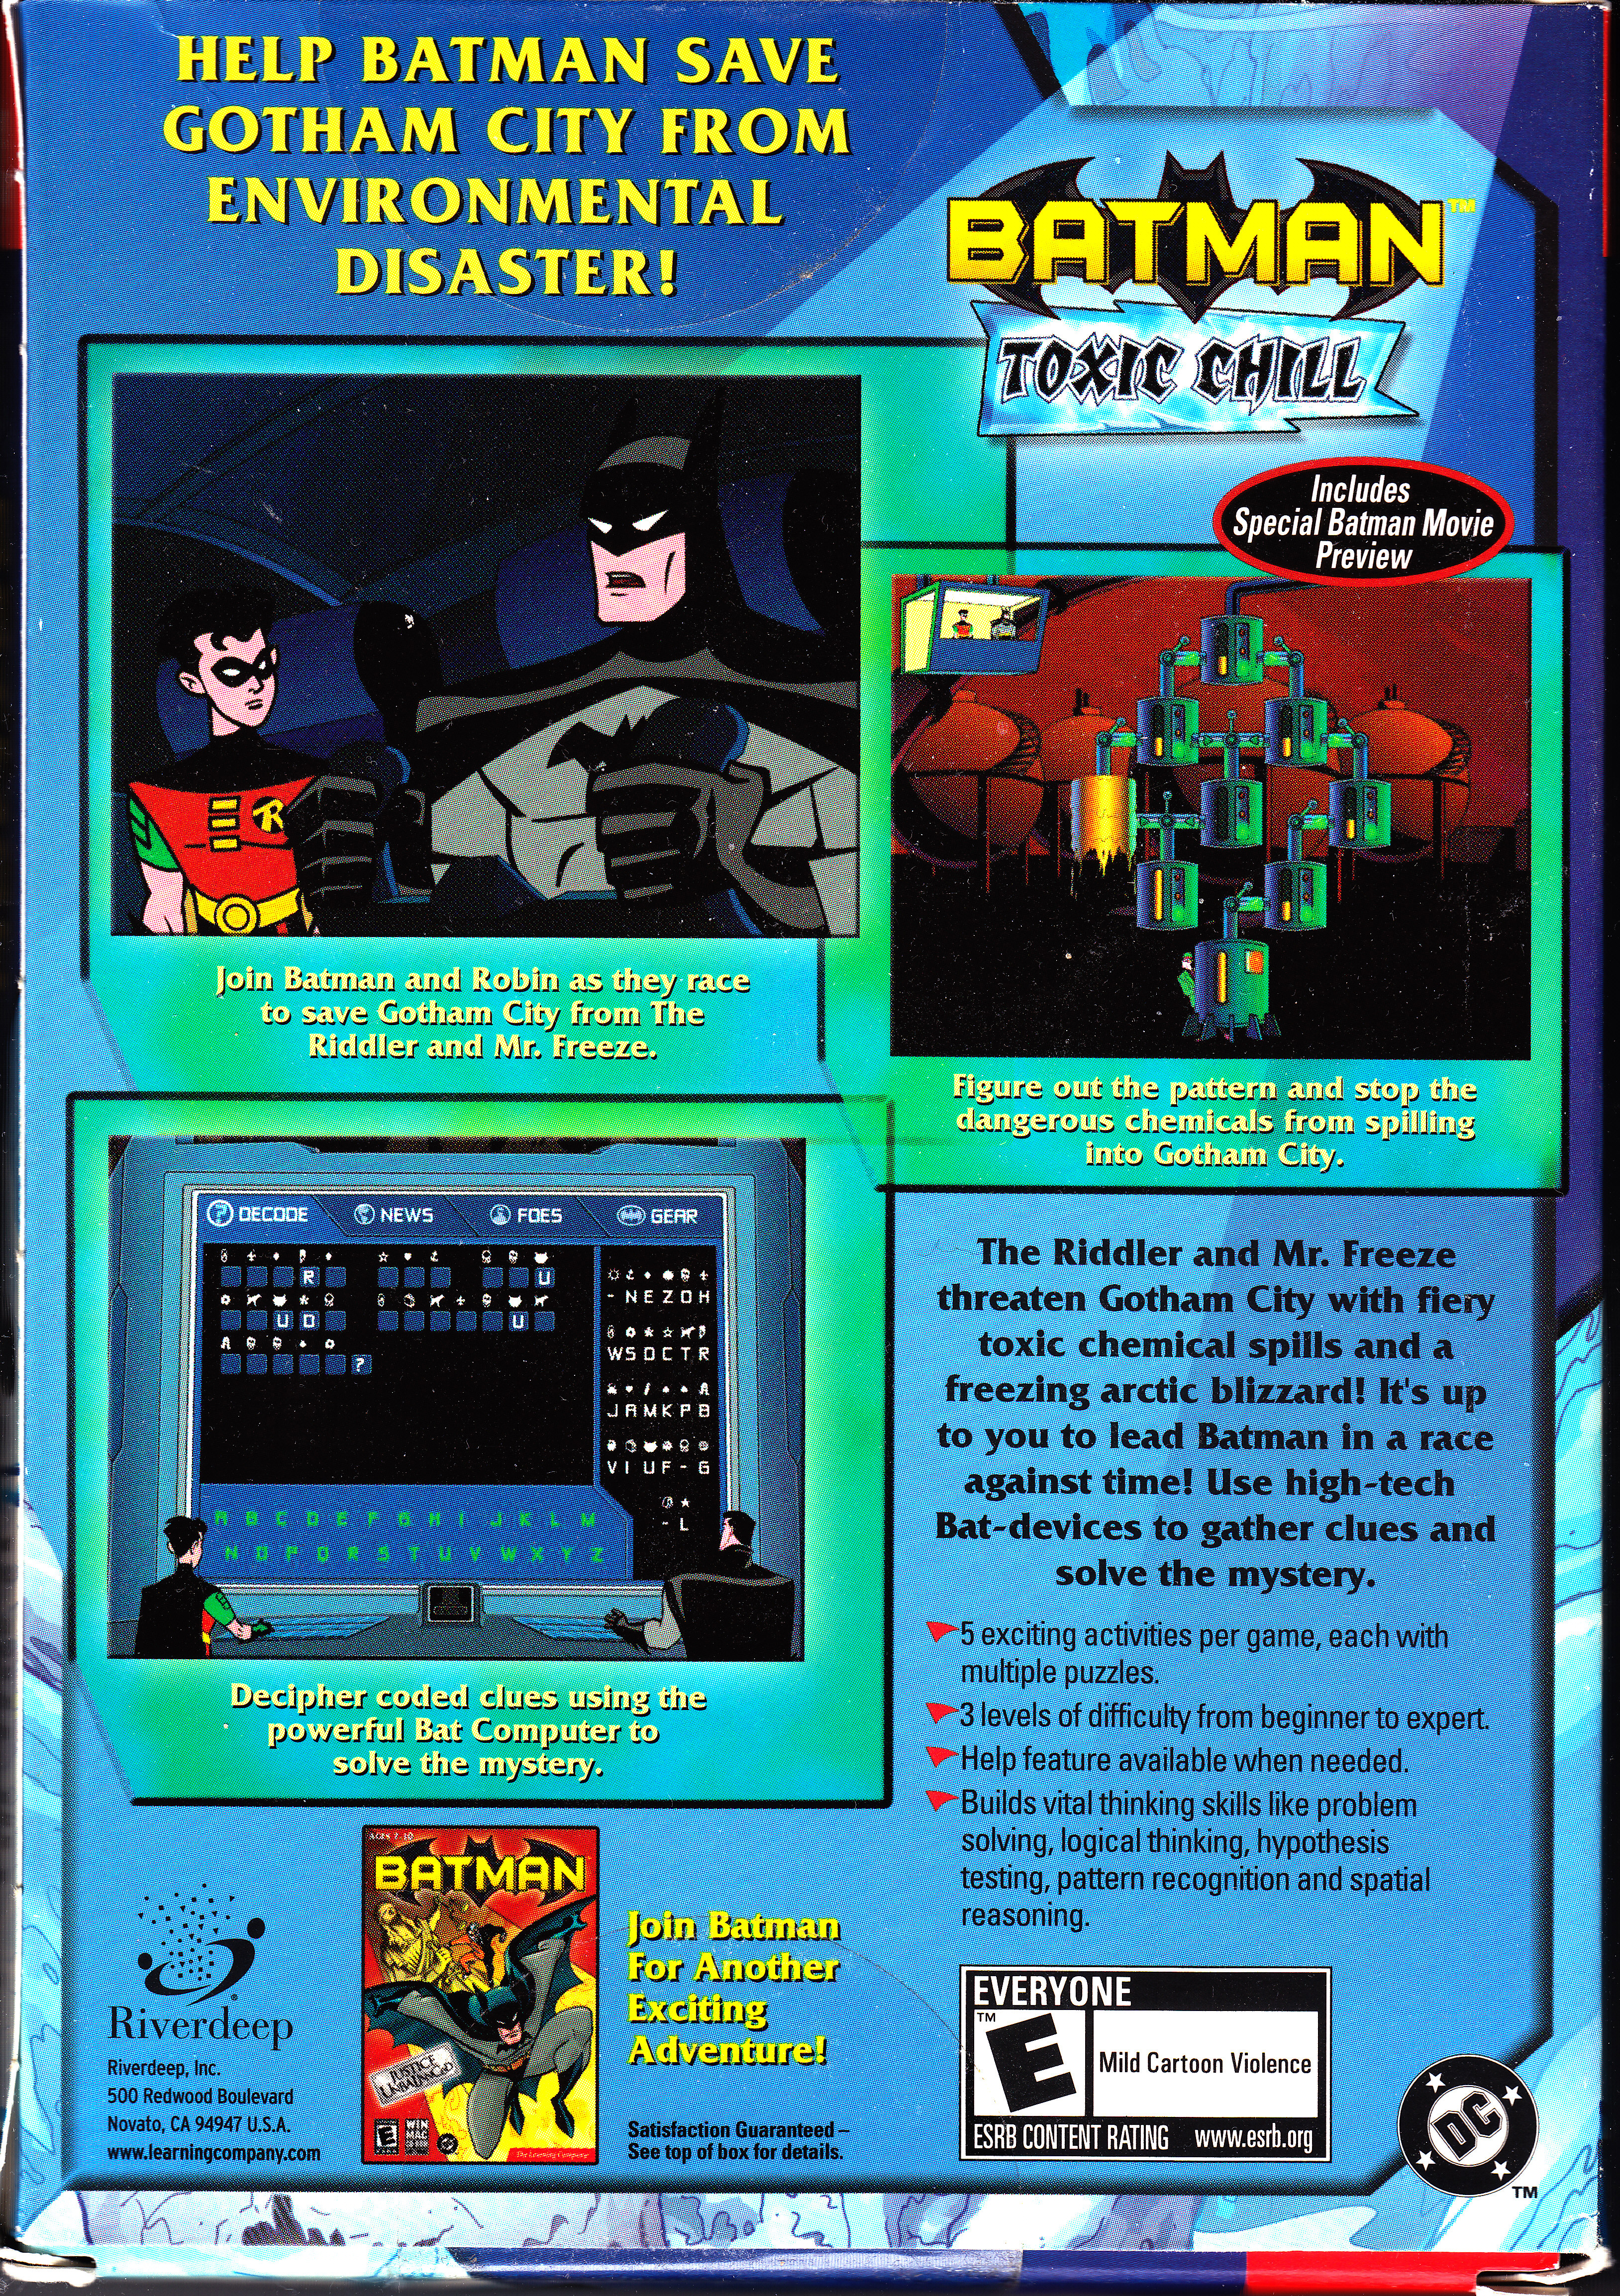 Batman: toxic chill screenshots for windows mobygames.